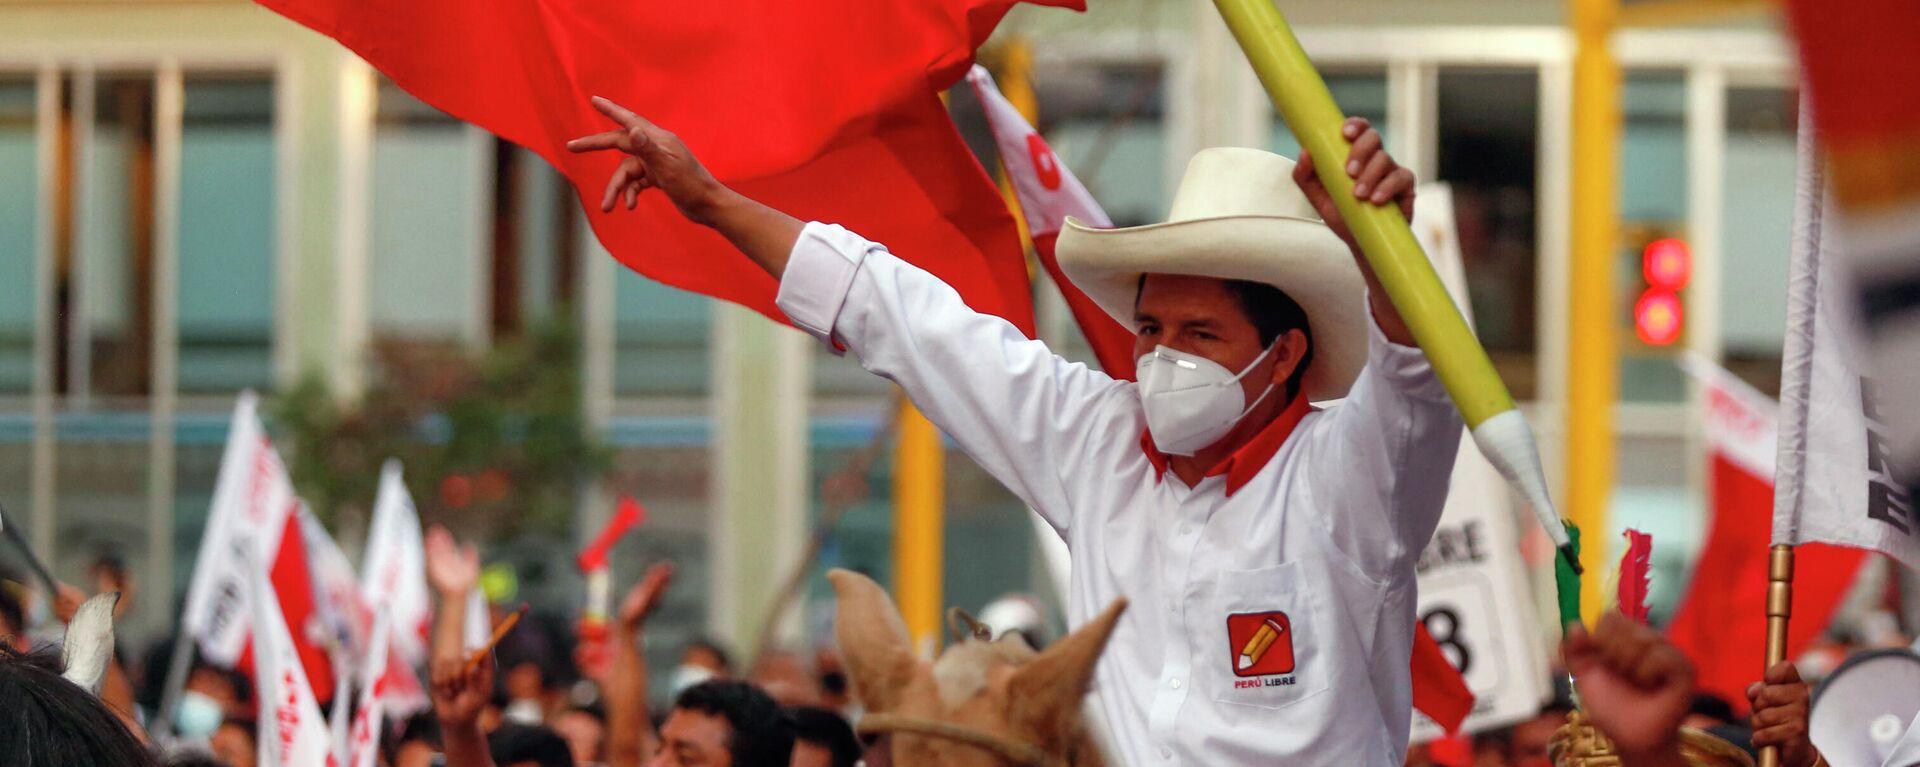 Pedro Castillo, candidato presidencial del partido Perú Libre - Sputnik Mundo, 1920, 25.05.2021